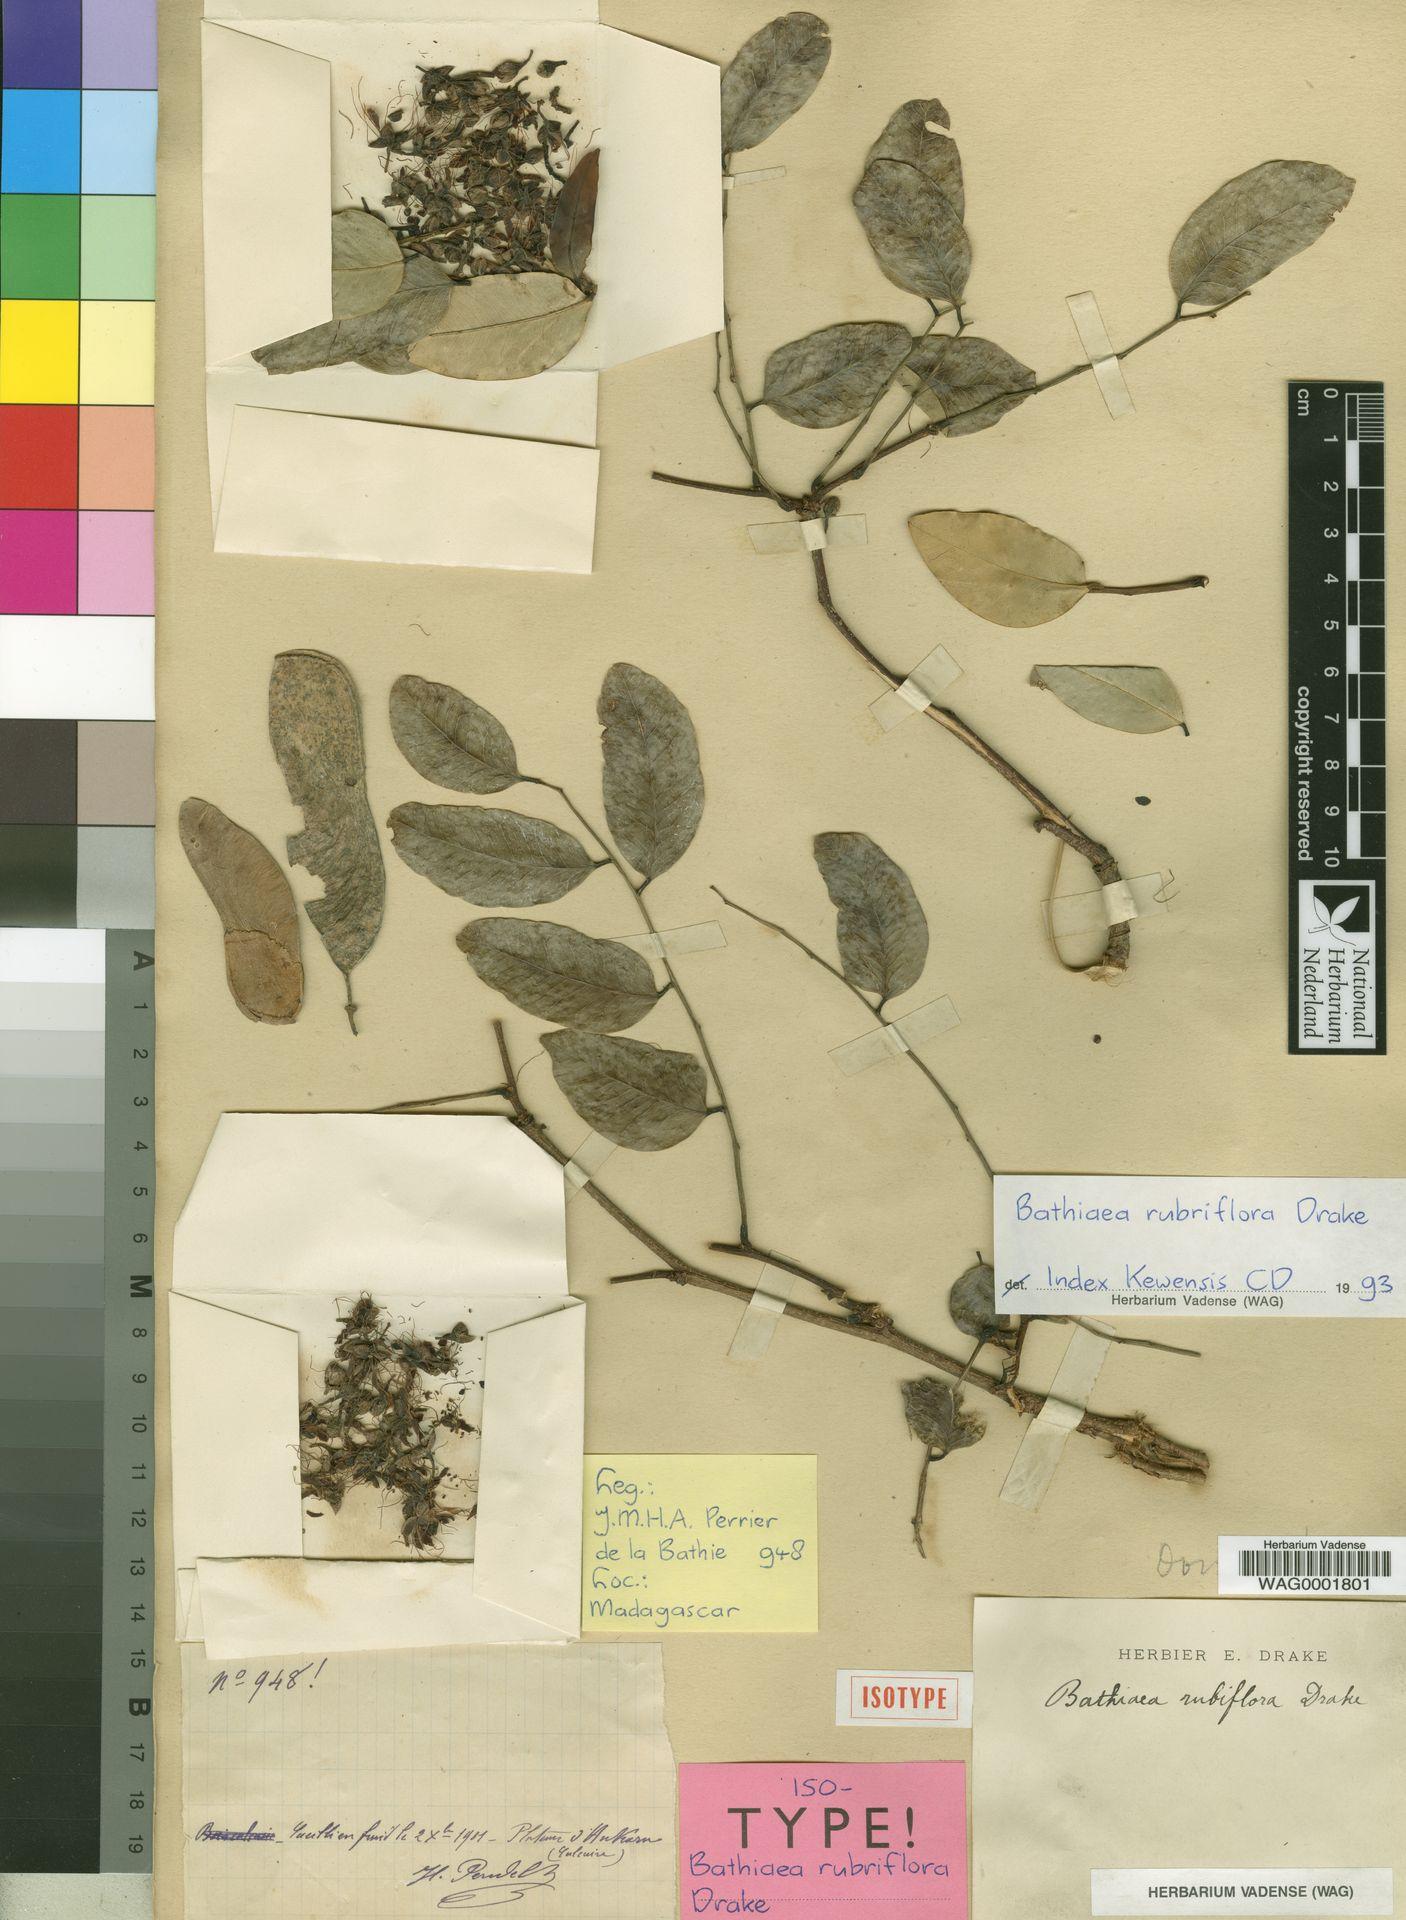 WAG0001801 | Bathiaea rubriflora Drake